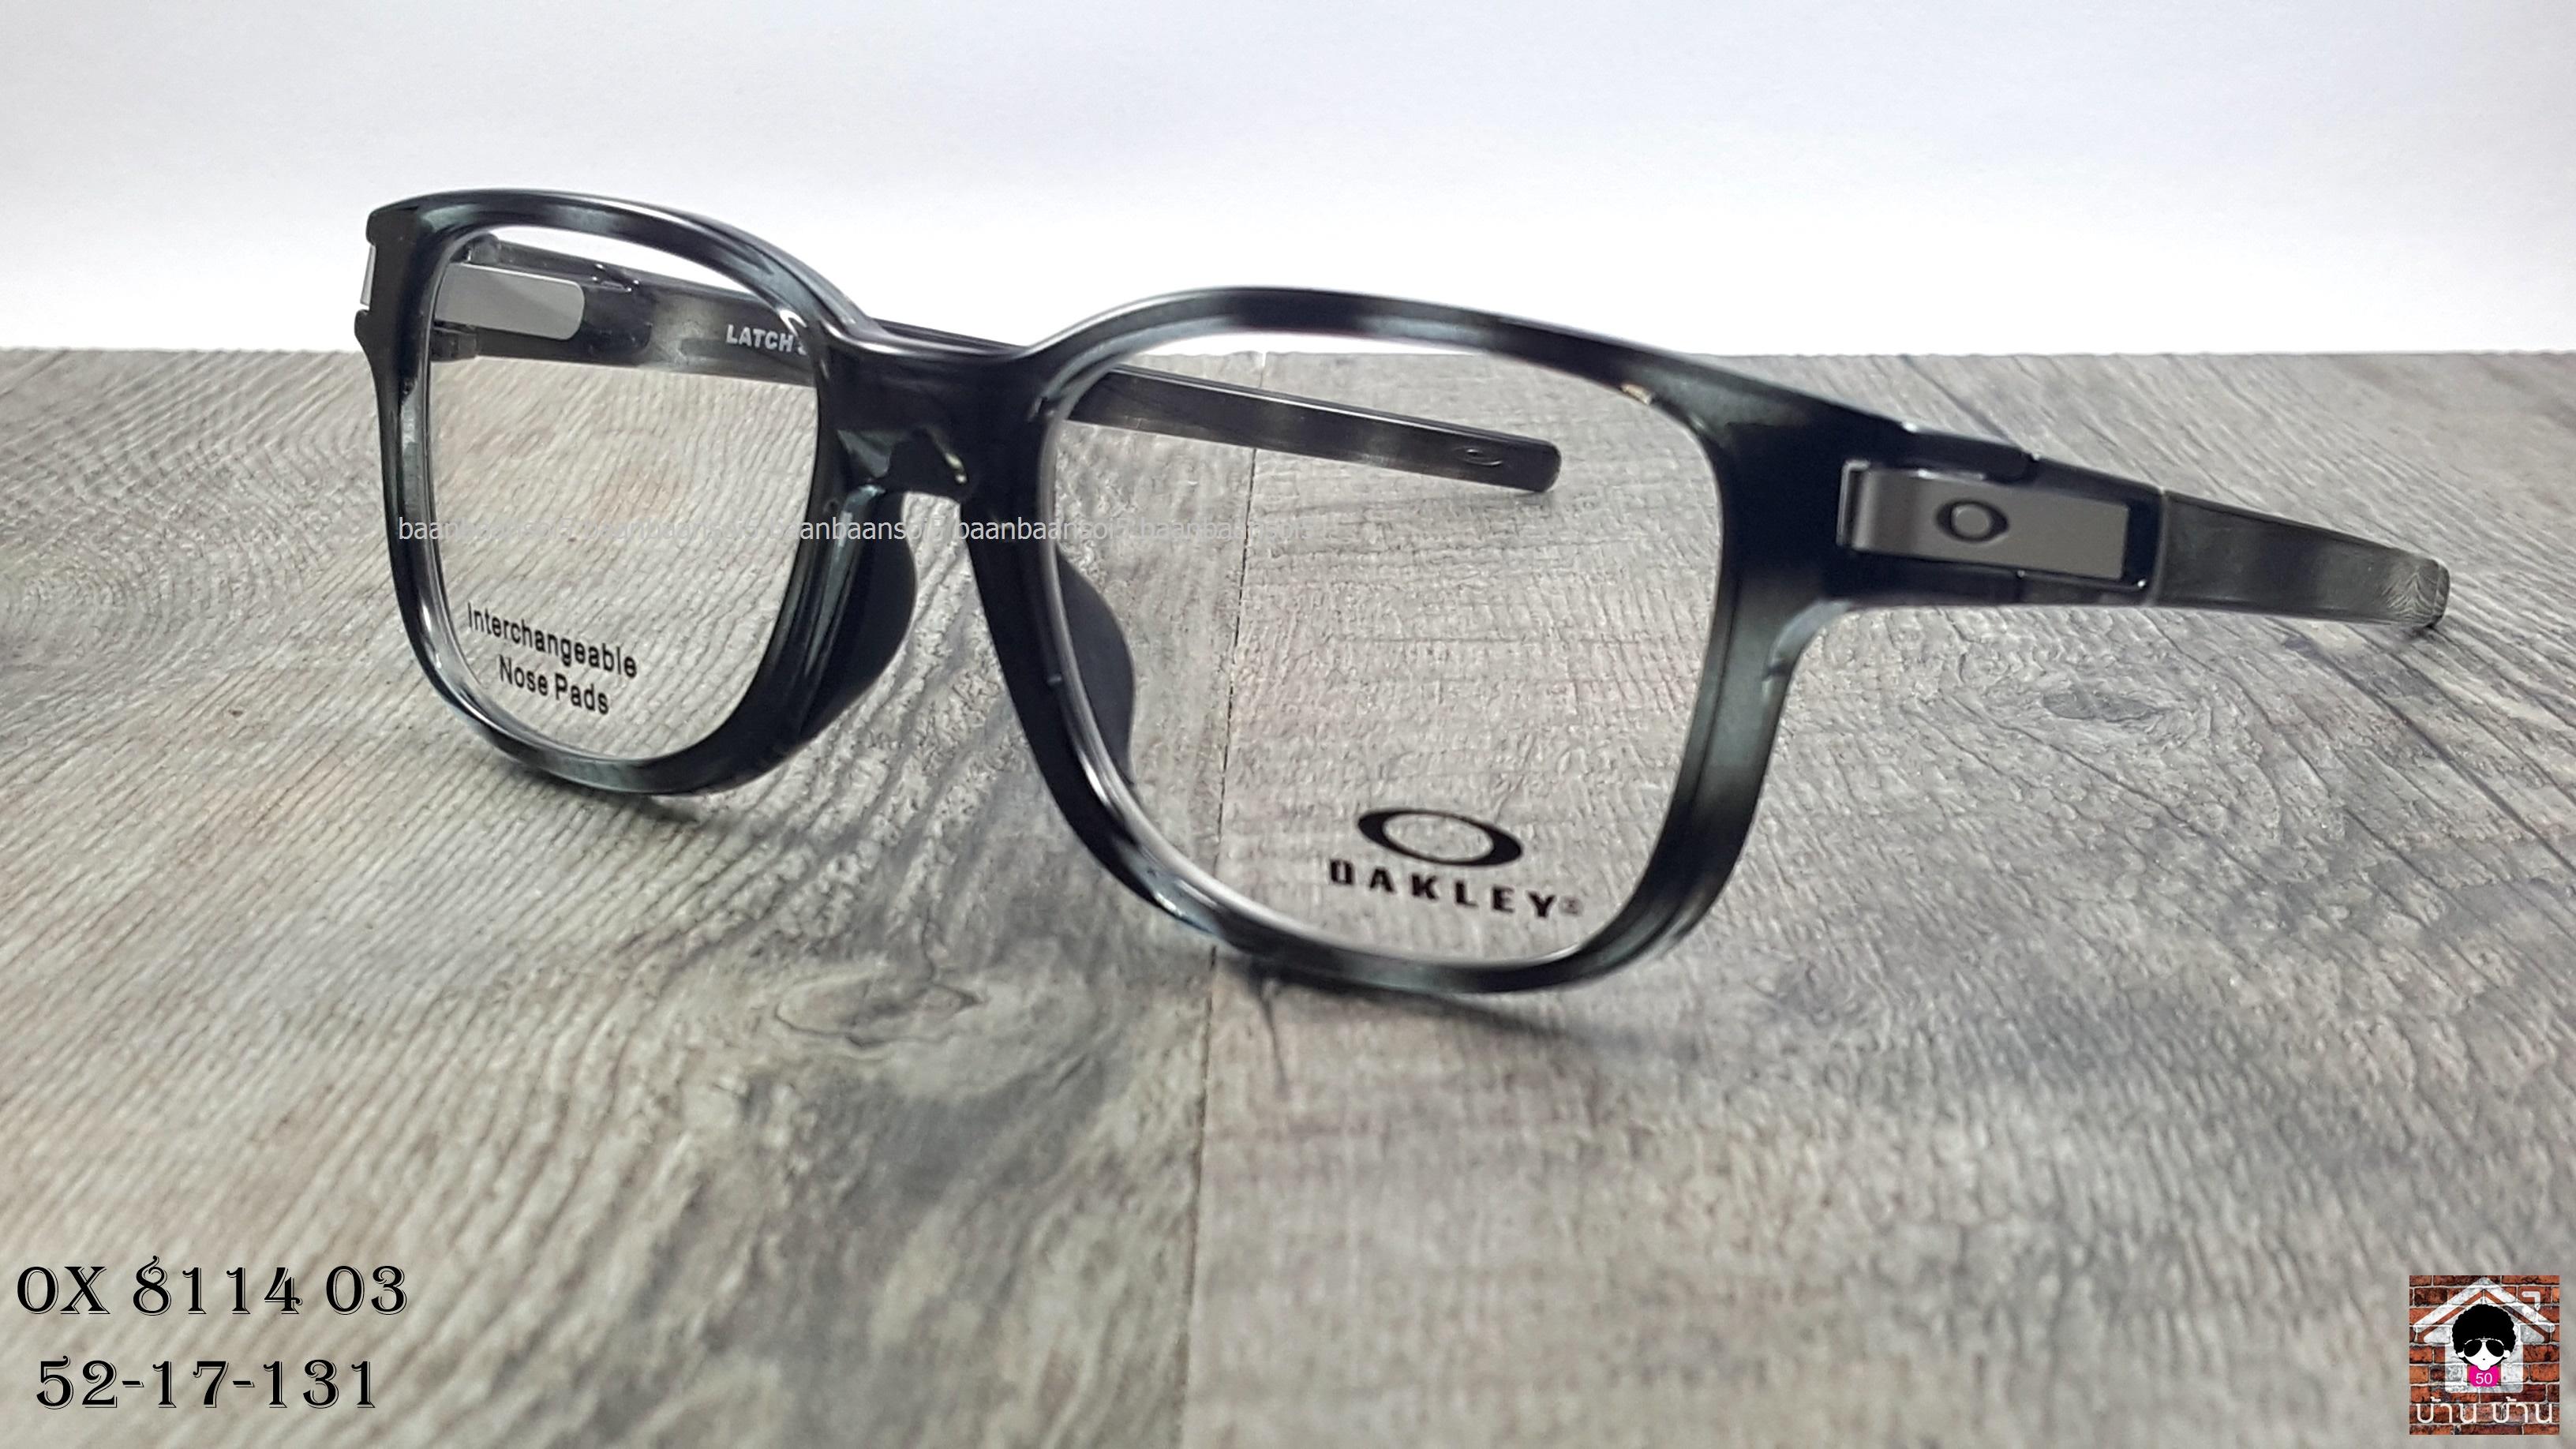 OAKLEY OX8114-03 Latch SS (MNP) โปรโมชั่น กรอบแว่นตาพร้อมเลนส์ HOYA ราคา 4,700 บาท